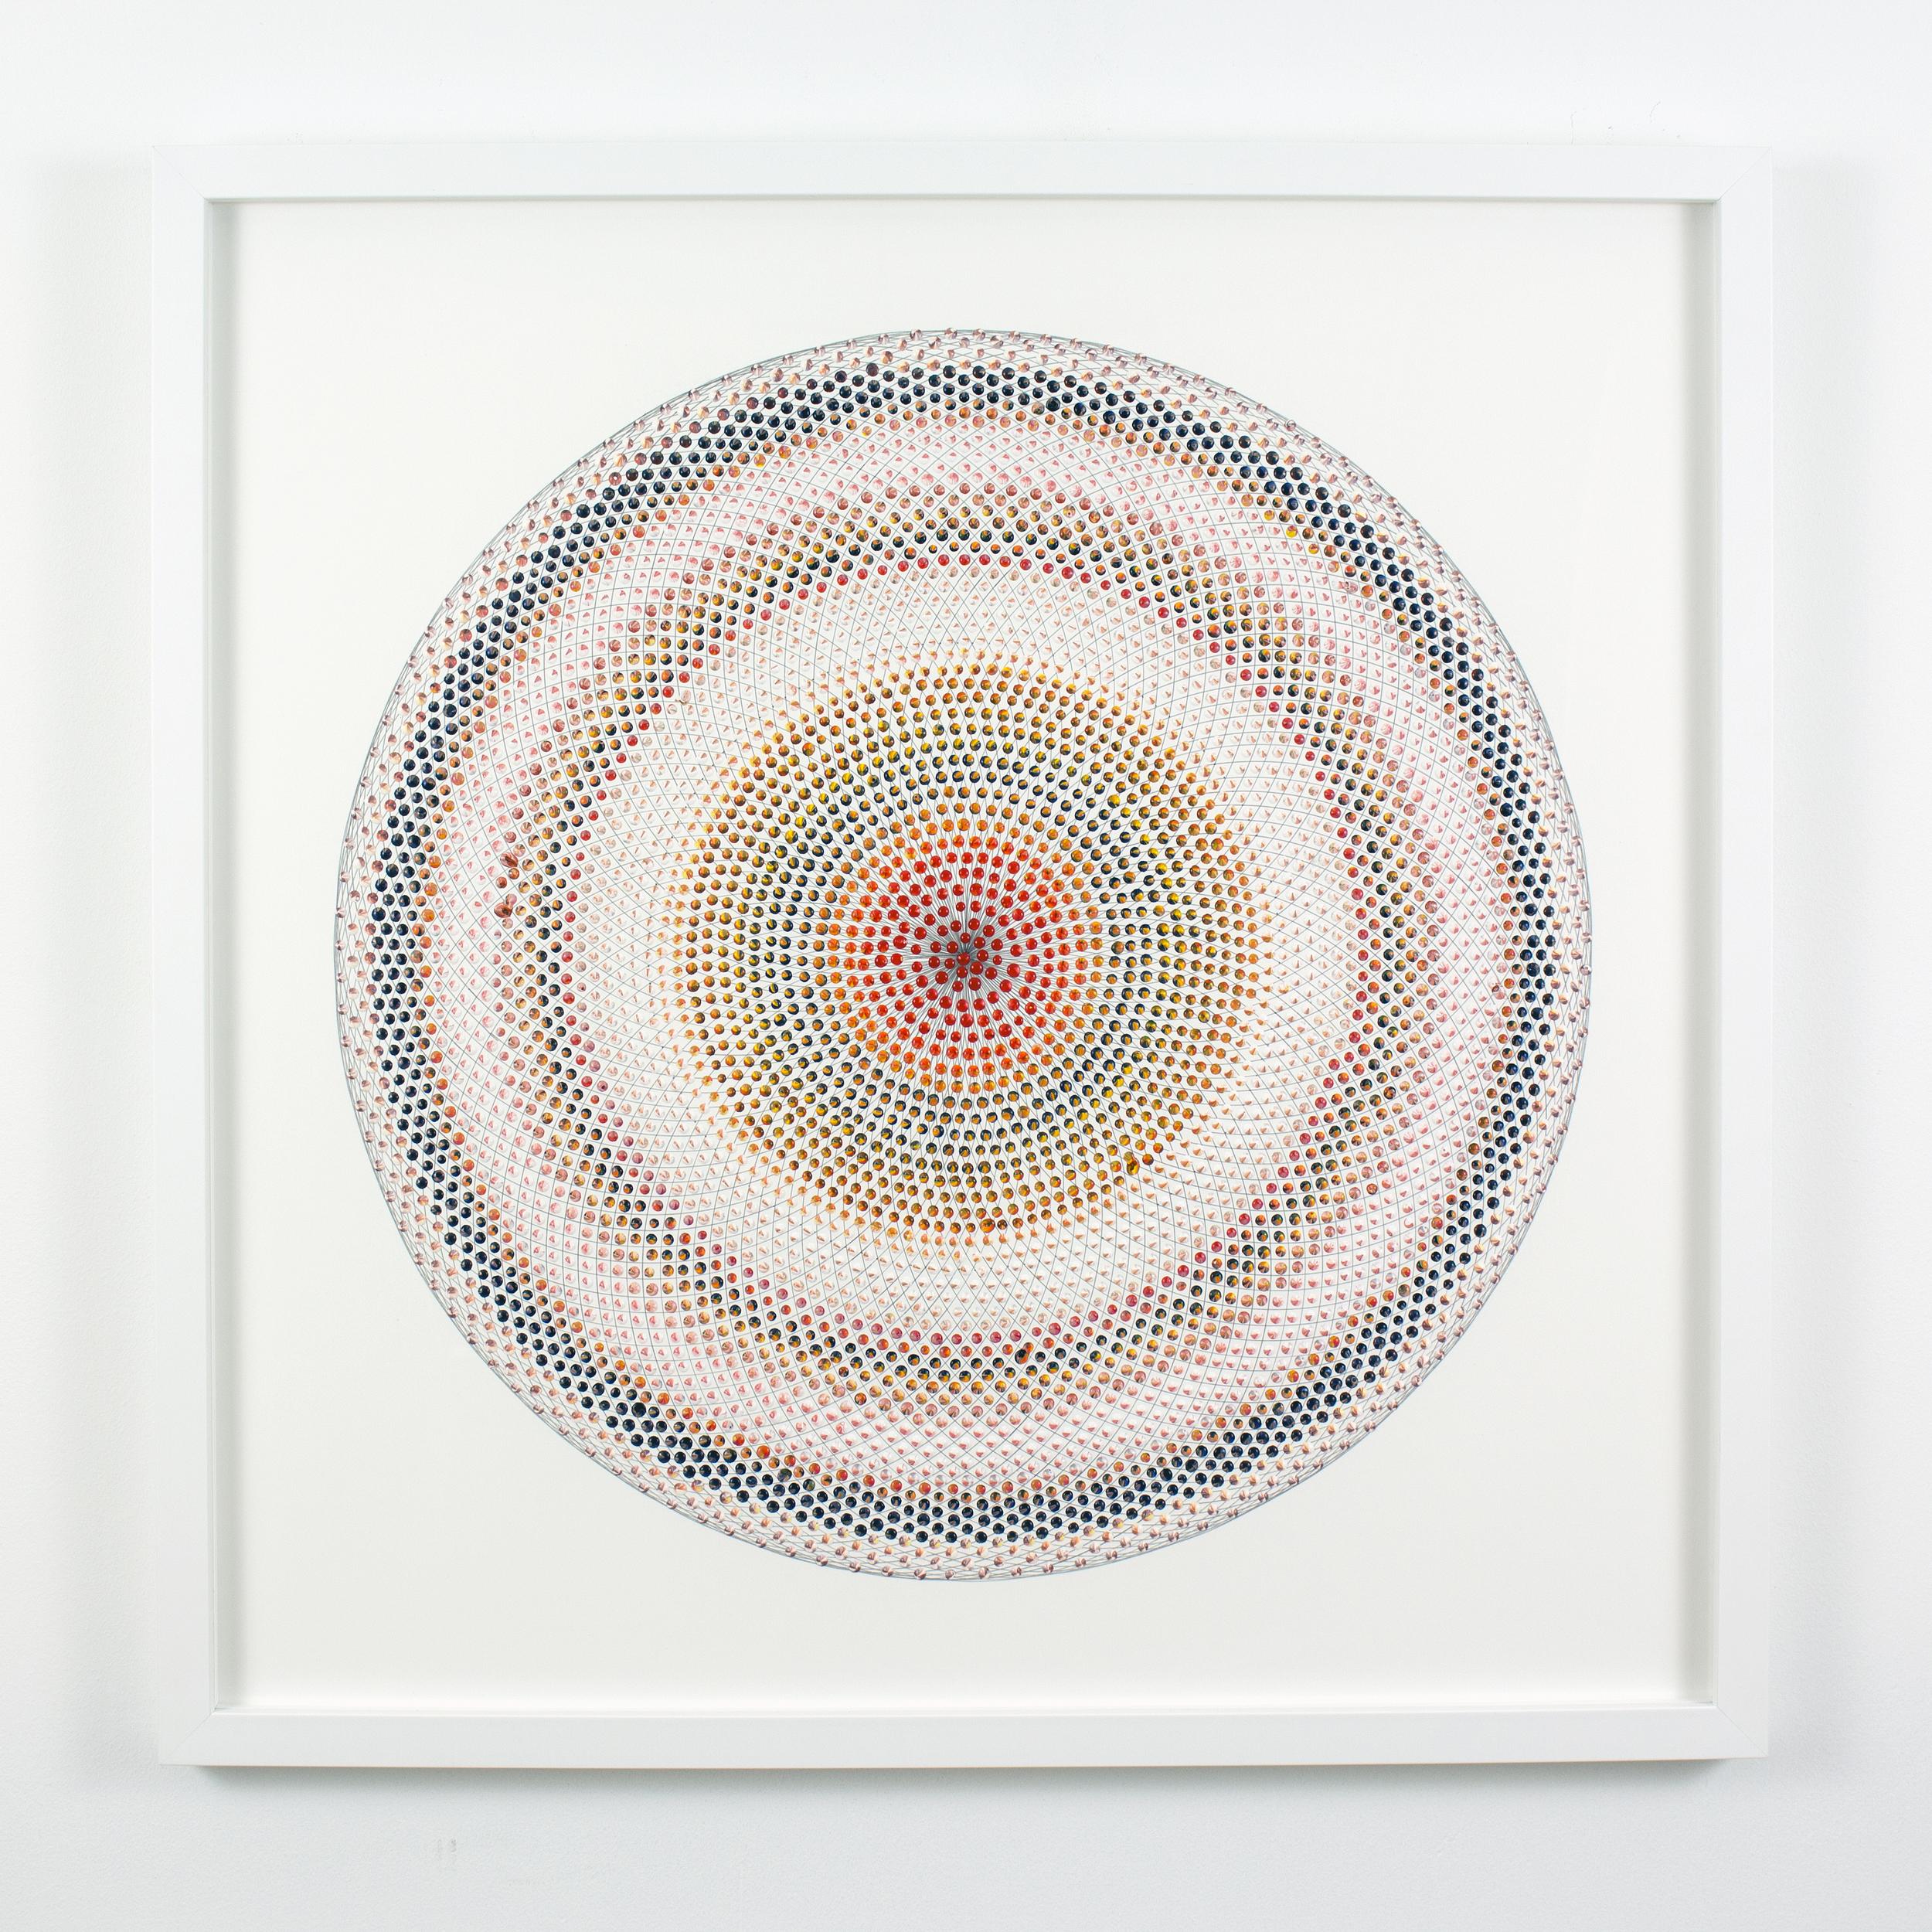 Untitled (RYOPg), acrylic on paper, 2015, 24 x 24in | 60 x 60cm